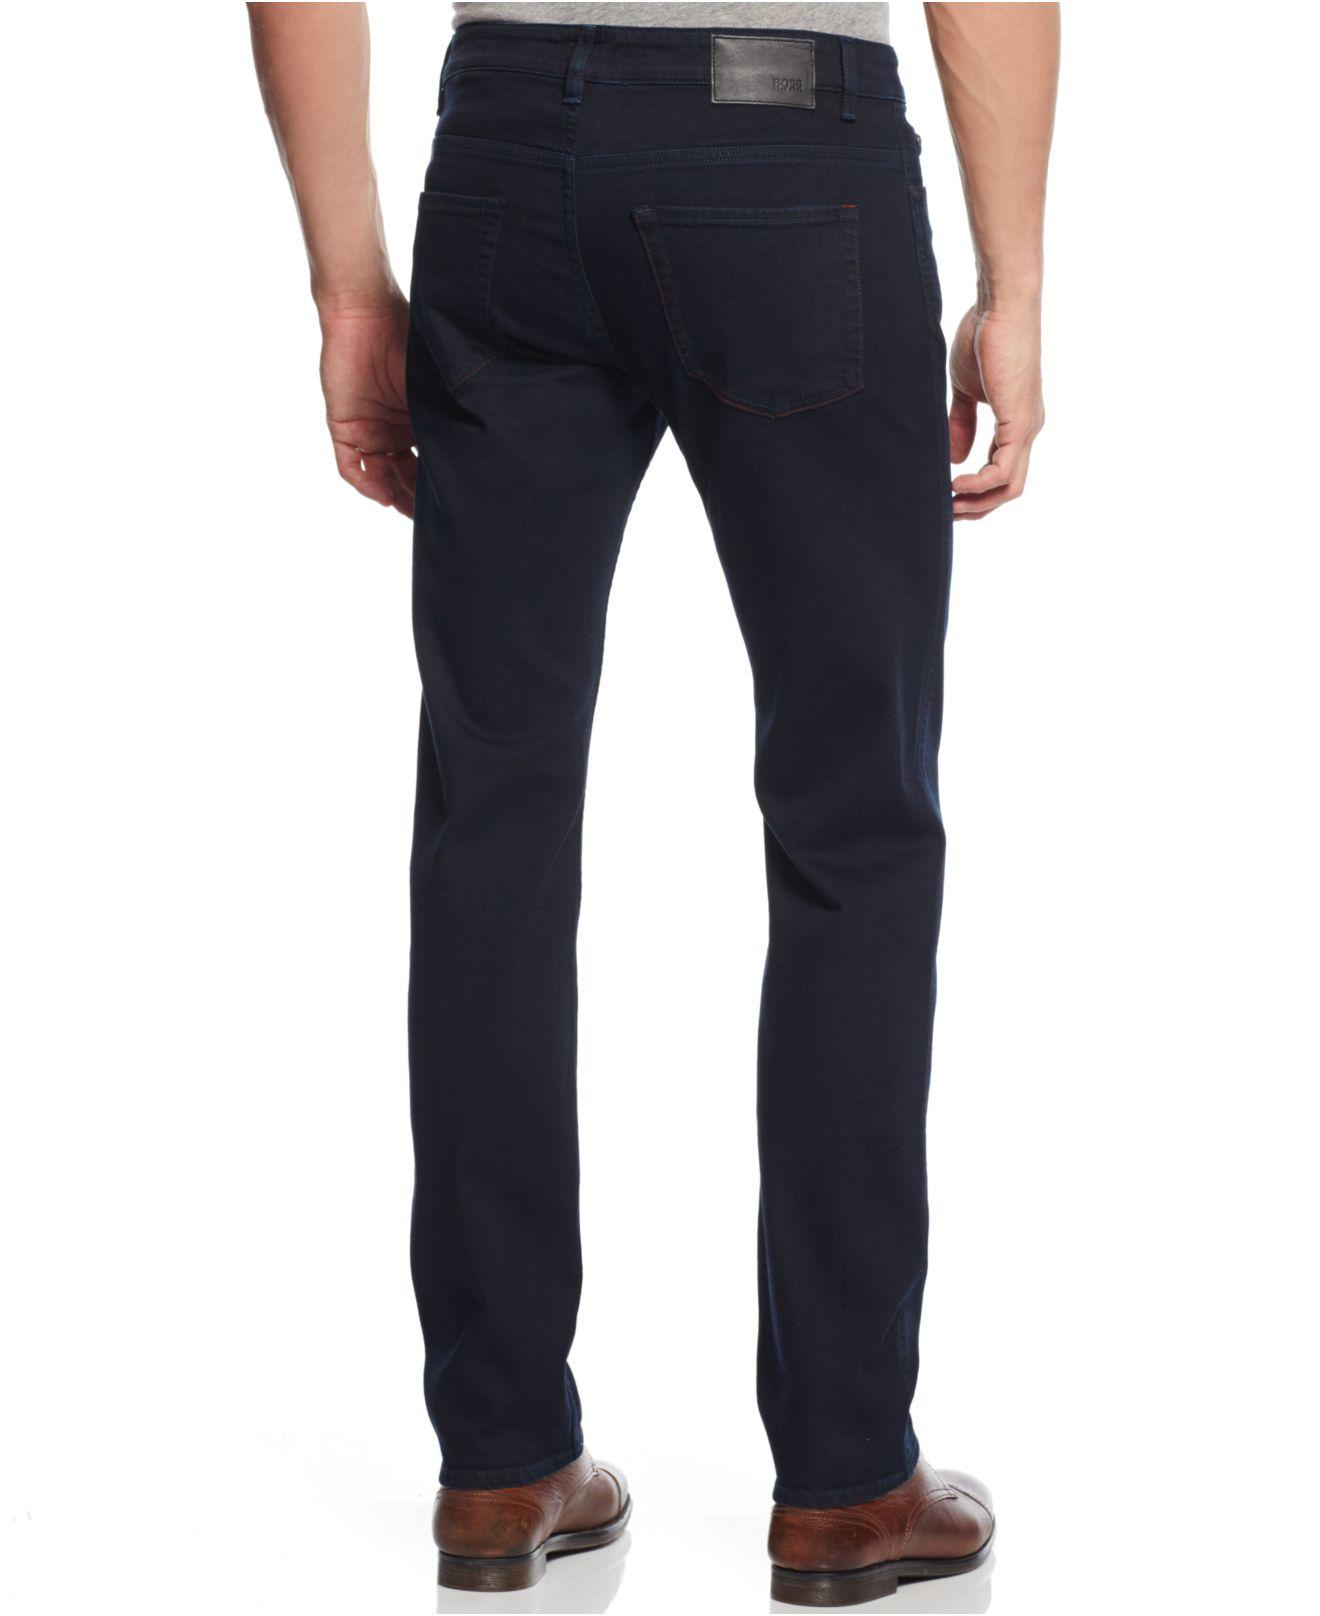 brunswick princeton family practice hugo boss delaware 1 jeans. Black Bedroom Furniture Sets. Home Design Ideas